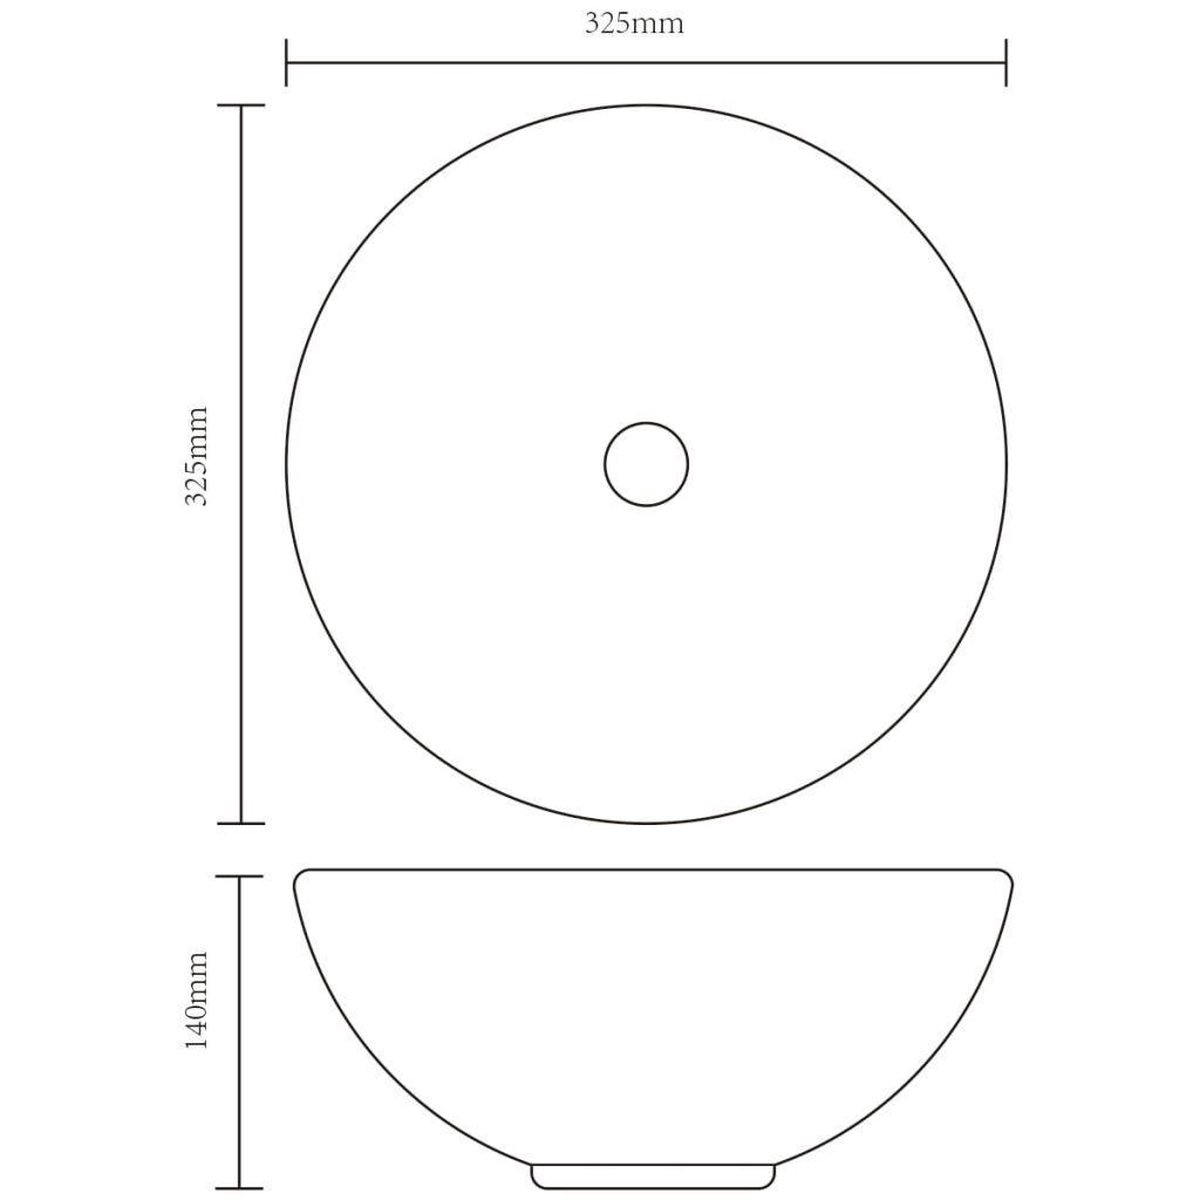 vidaXL Wasbak. keramiek. rond. zwart 325 mm